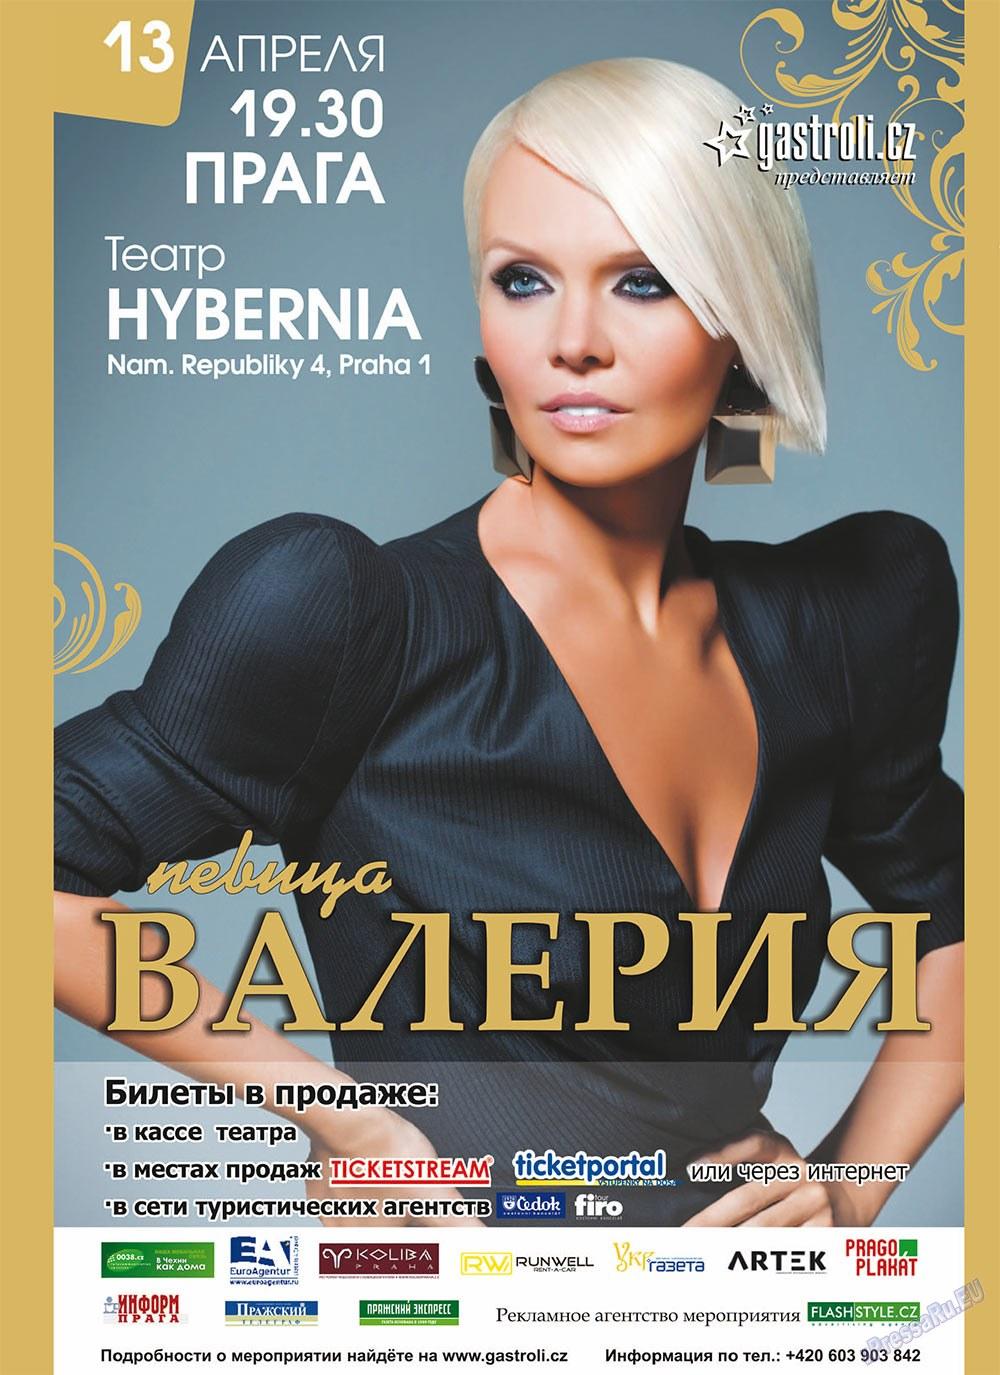 Артек (журнал). 2011 год, номер 1, стр. 52